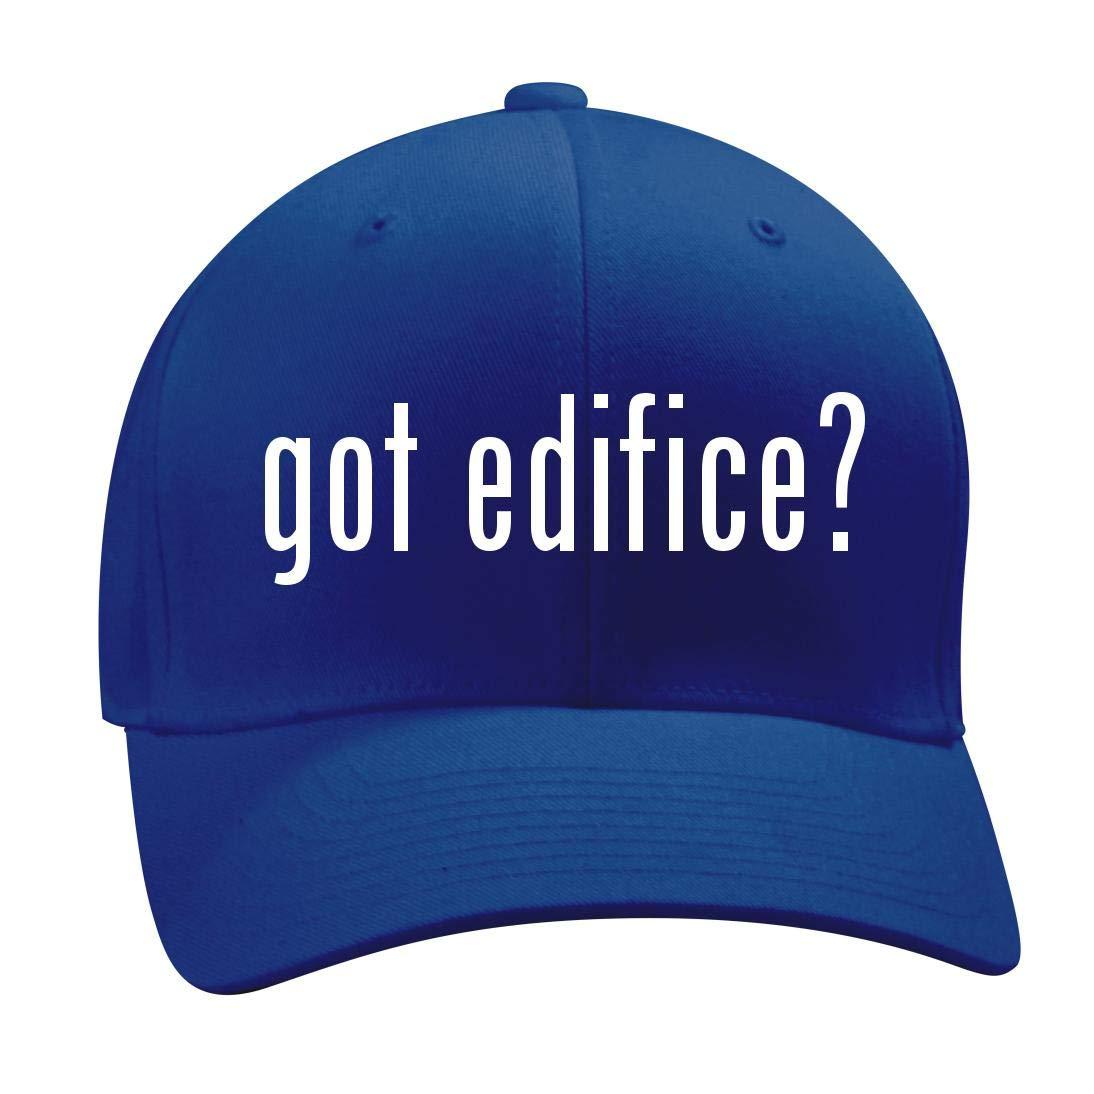 got Edifice? - A Nice Men's Adult Baseball Hat Cap, Blue, Small/Medium by Shirt Me Up